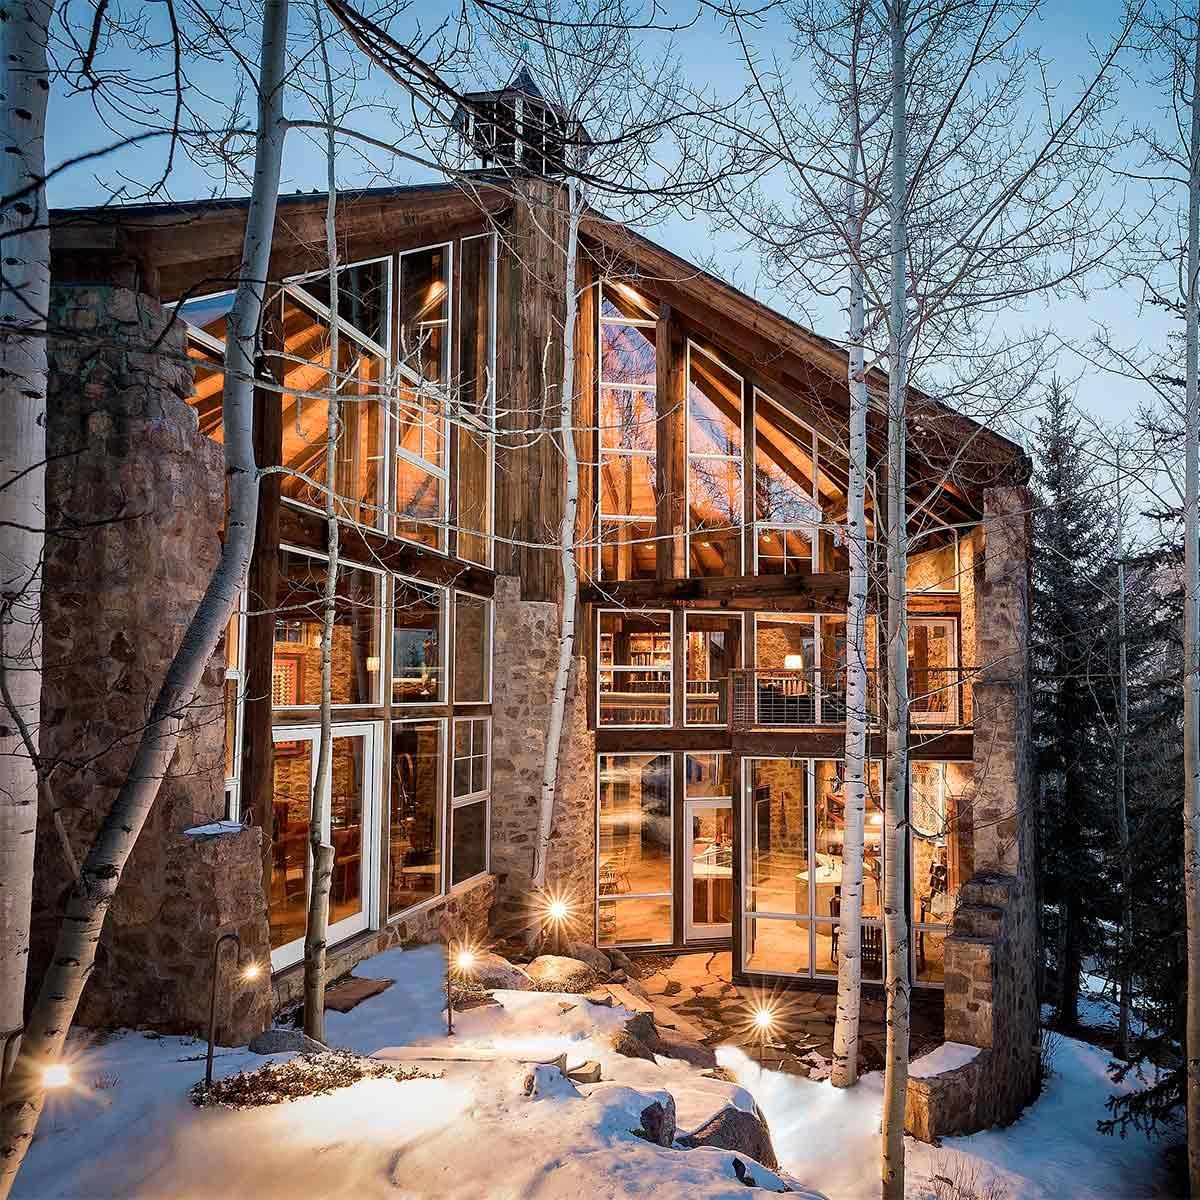 Lake Luxury Log Homes: Best Cabin Decor Blog